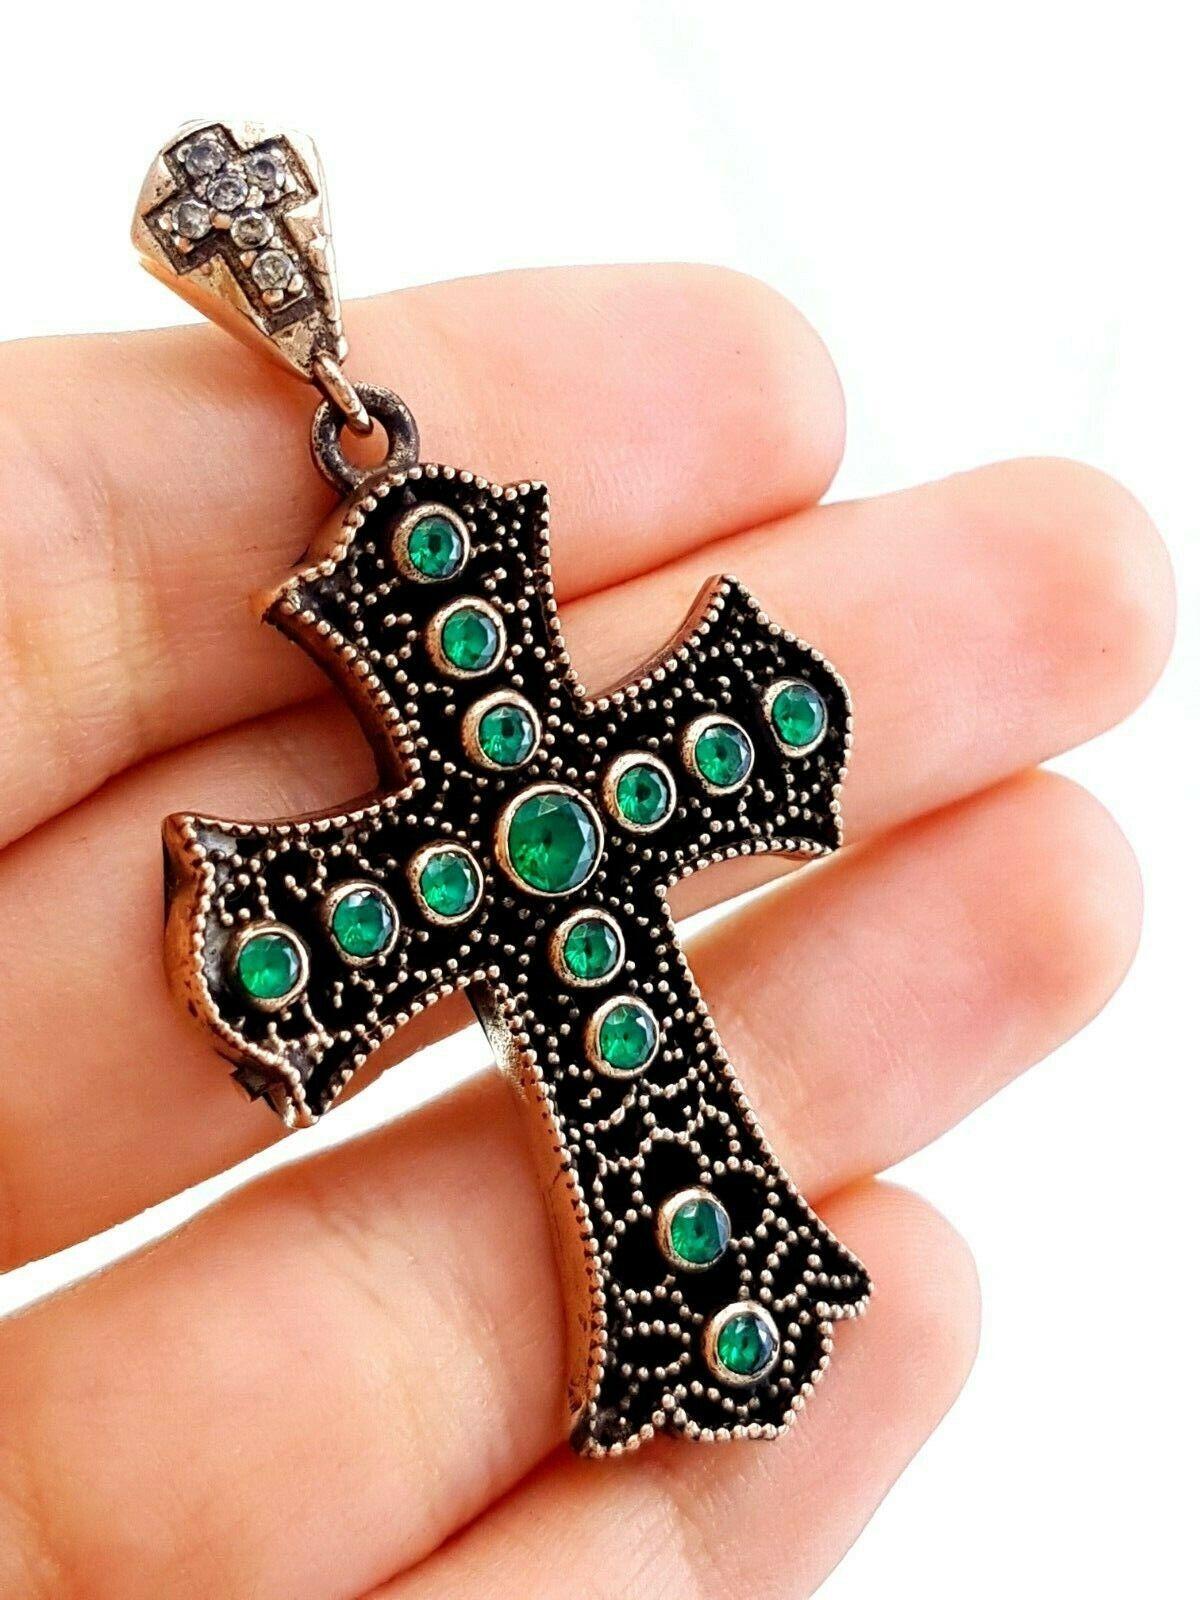 Turkish Handmade Jewelry 925 Sterling Silver Emerald Holy Cross Pendant B10